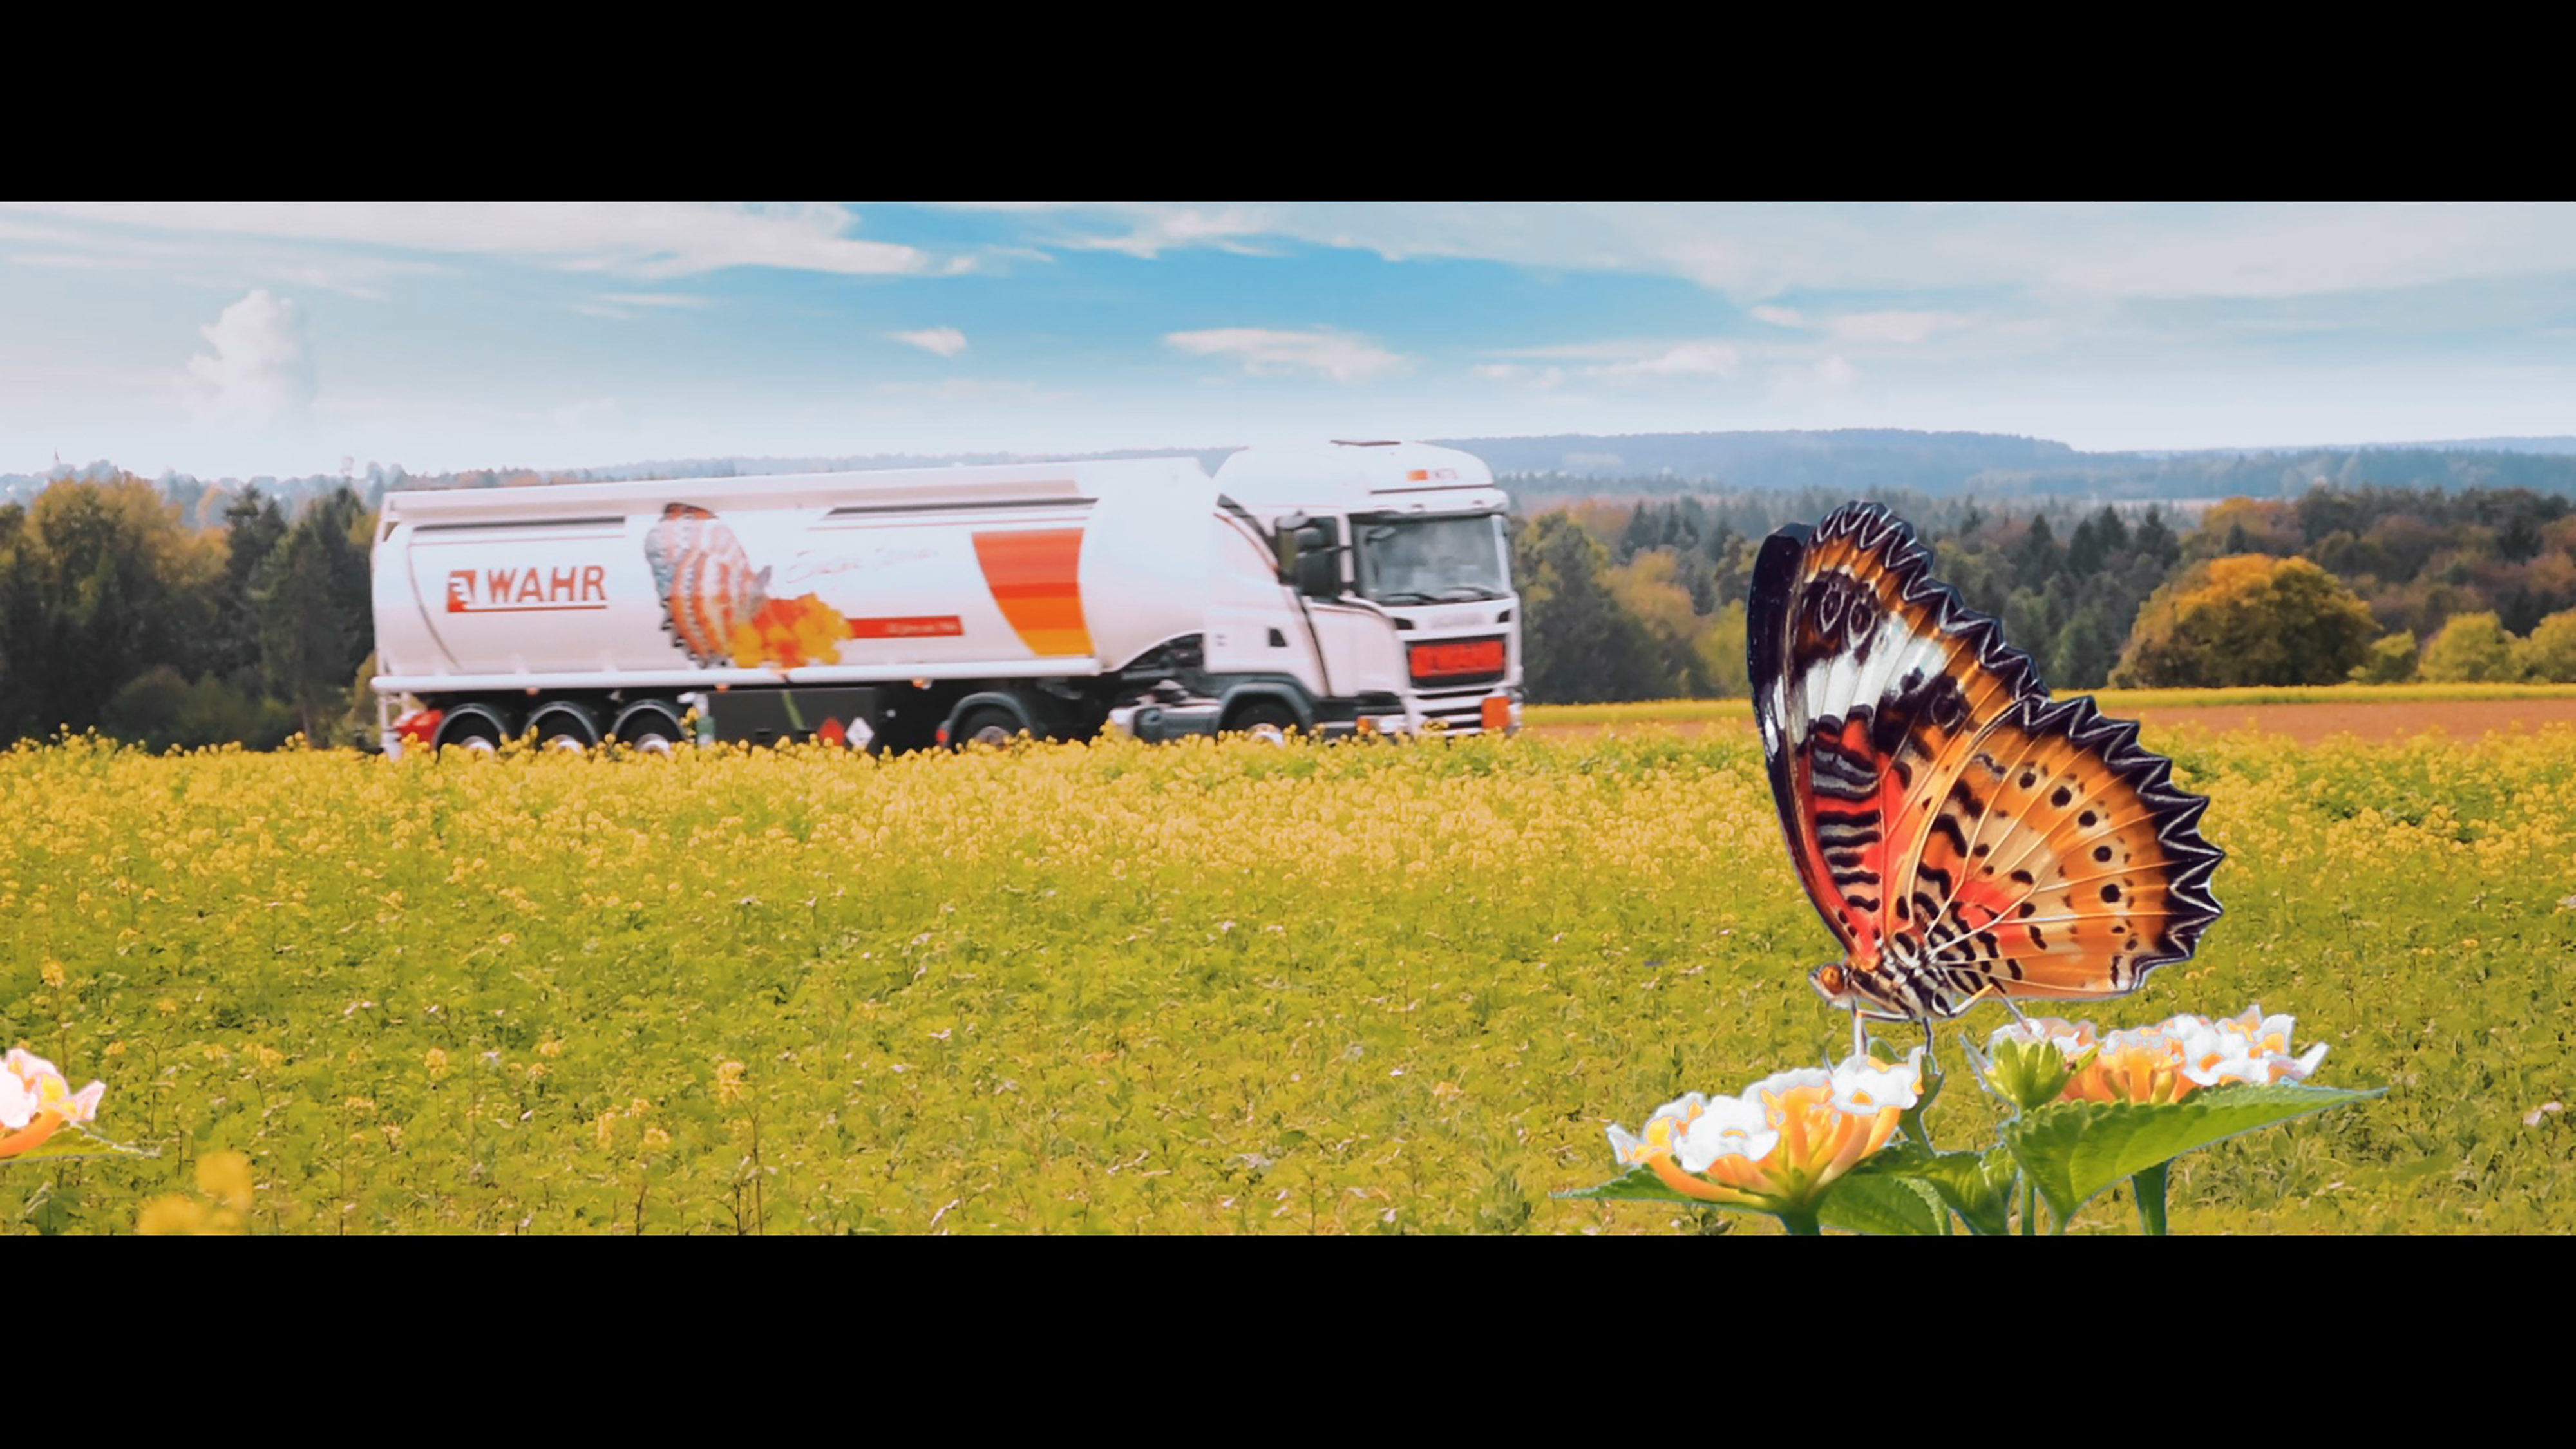 Fritz Wahr Energie GmbH & Co. KG